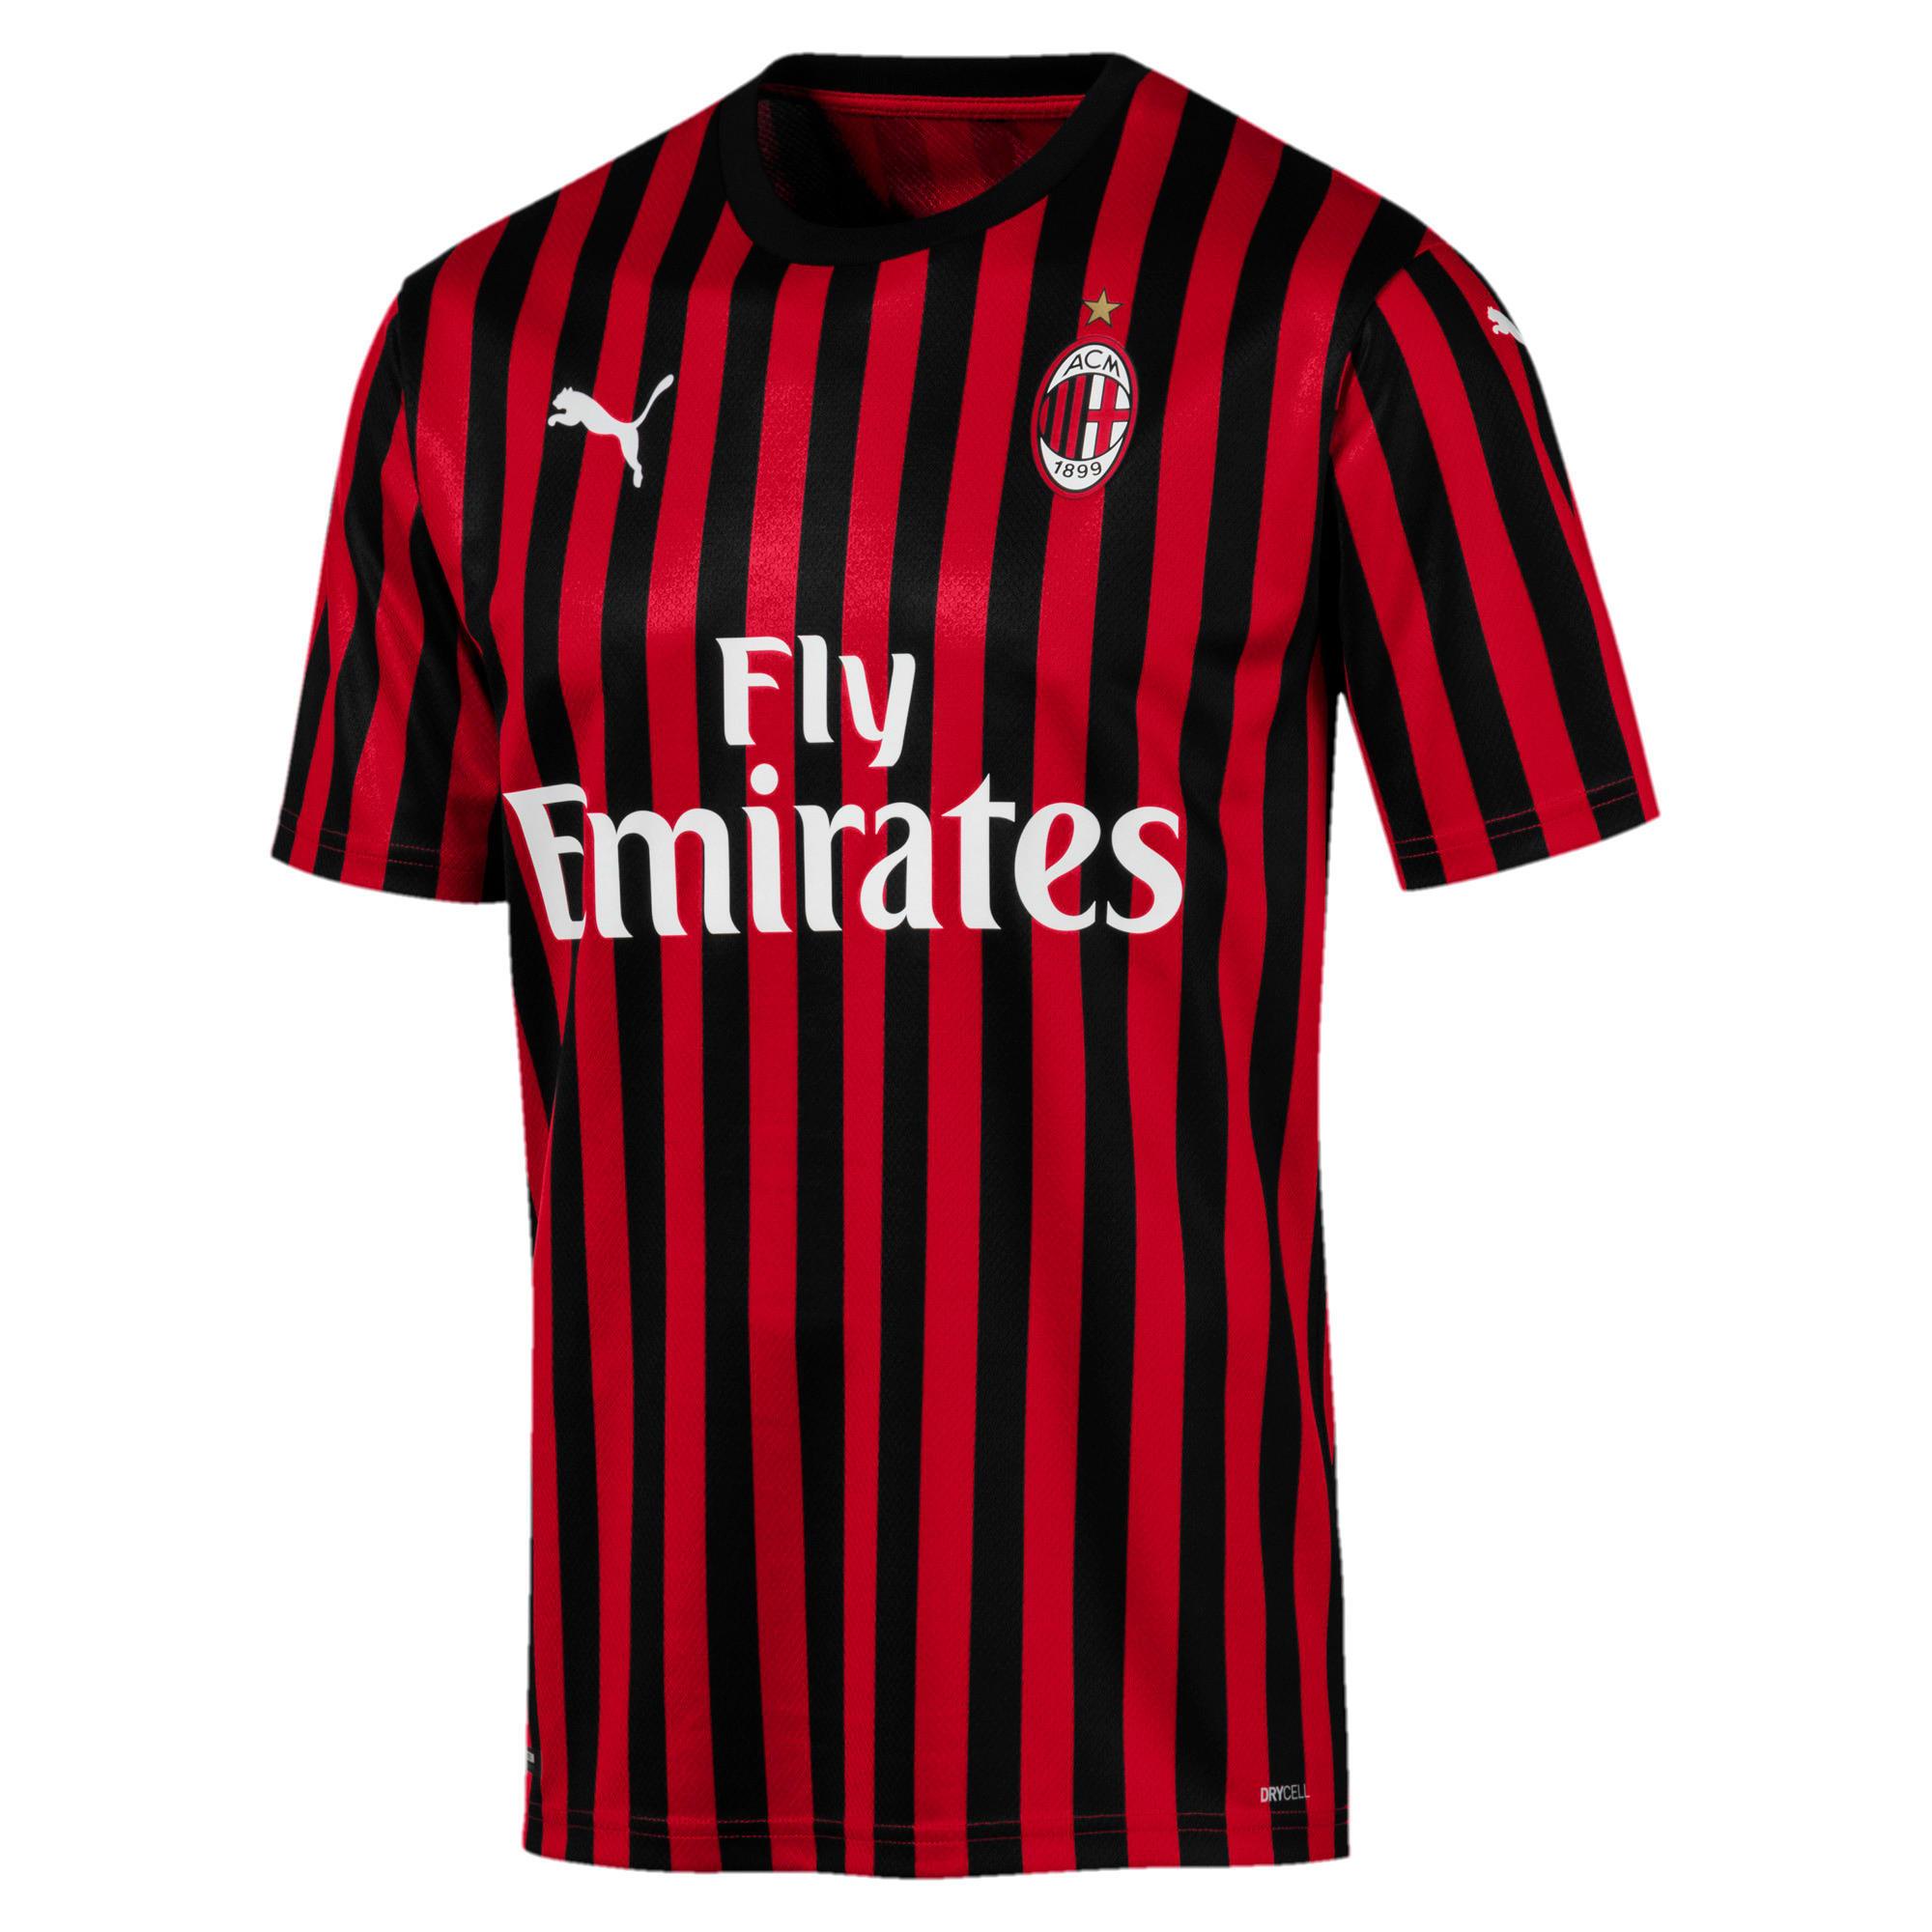 Thumbnail 1 of AC Milan Home Authentic Short Sleeve Men's Jersey, Tango Red -Puma Black, medium